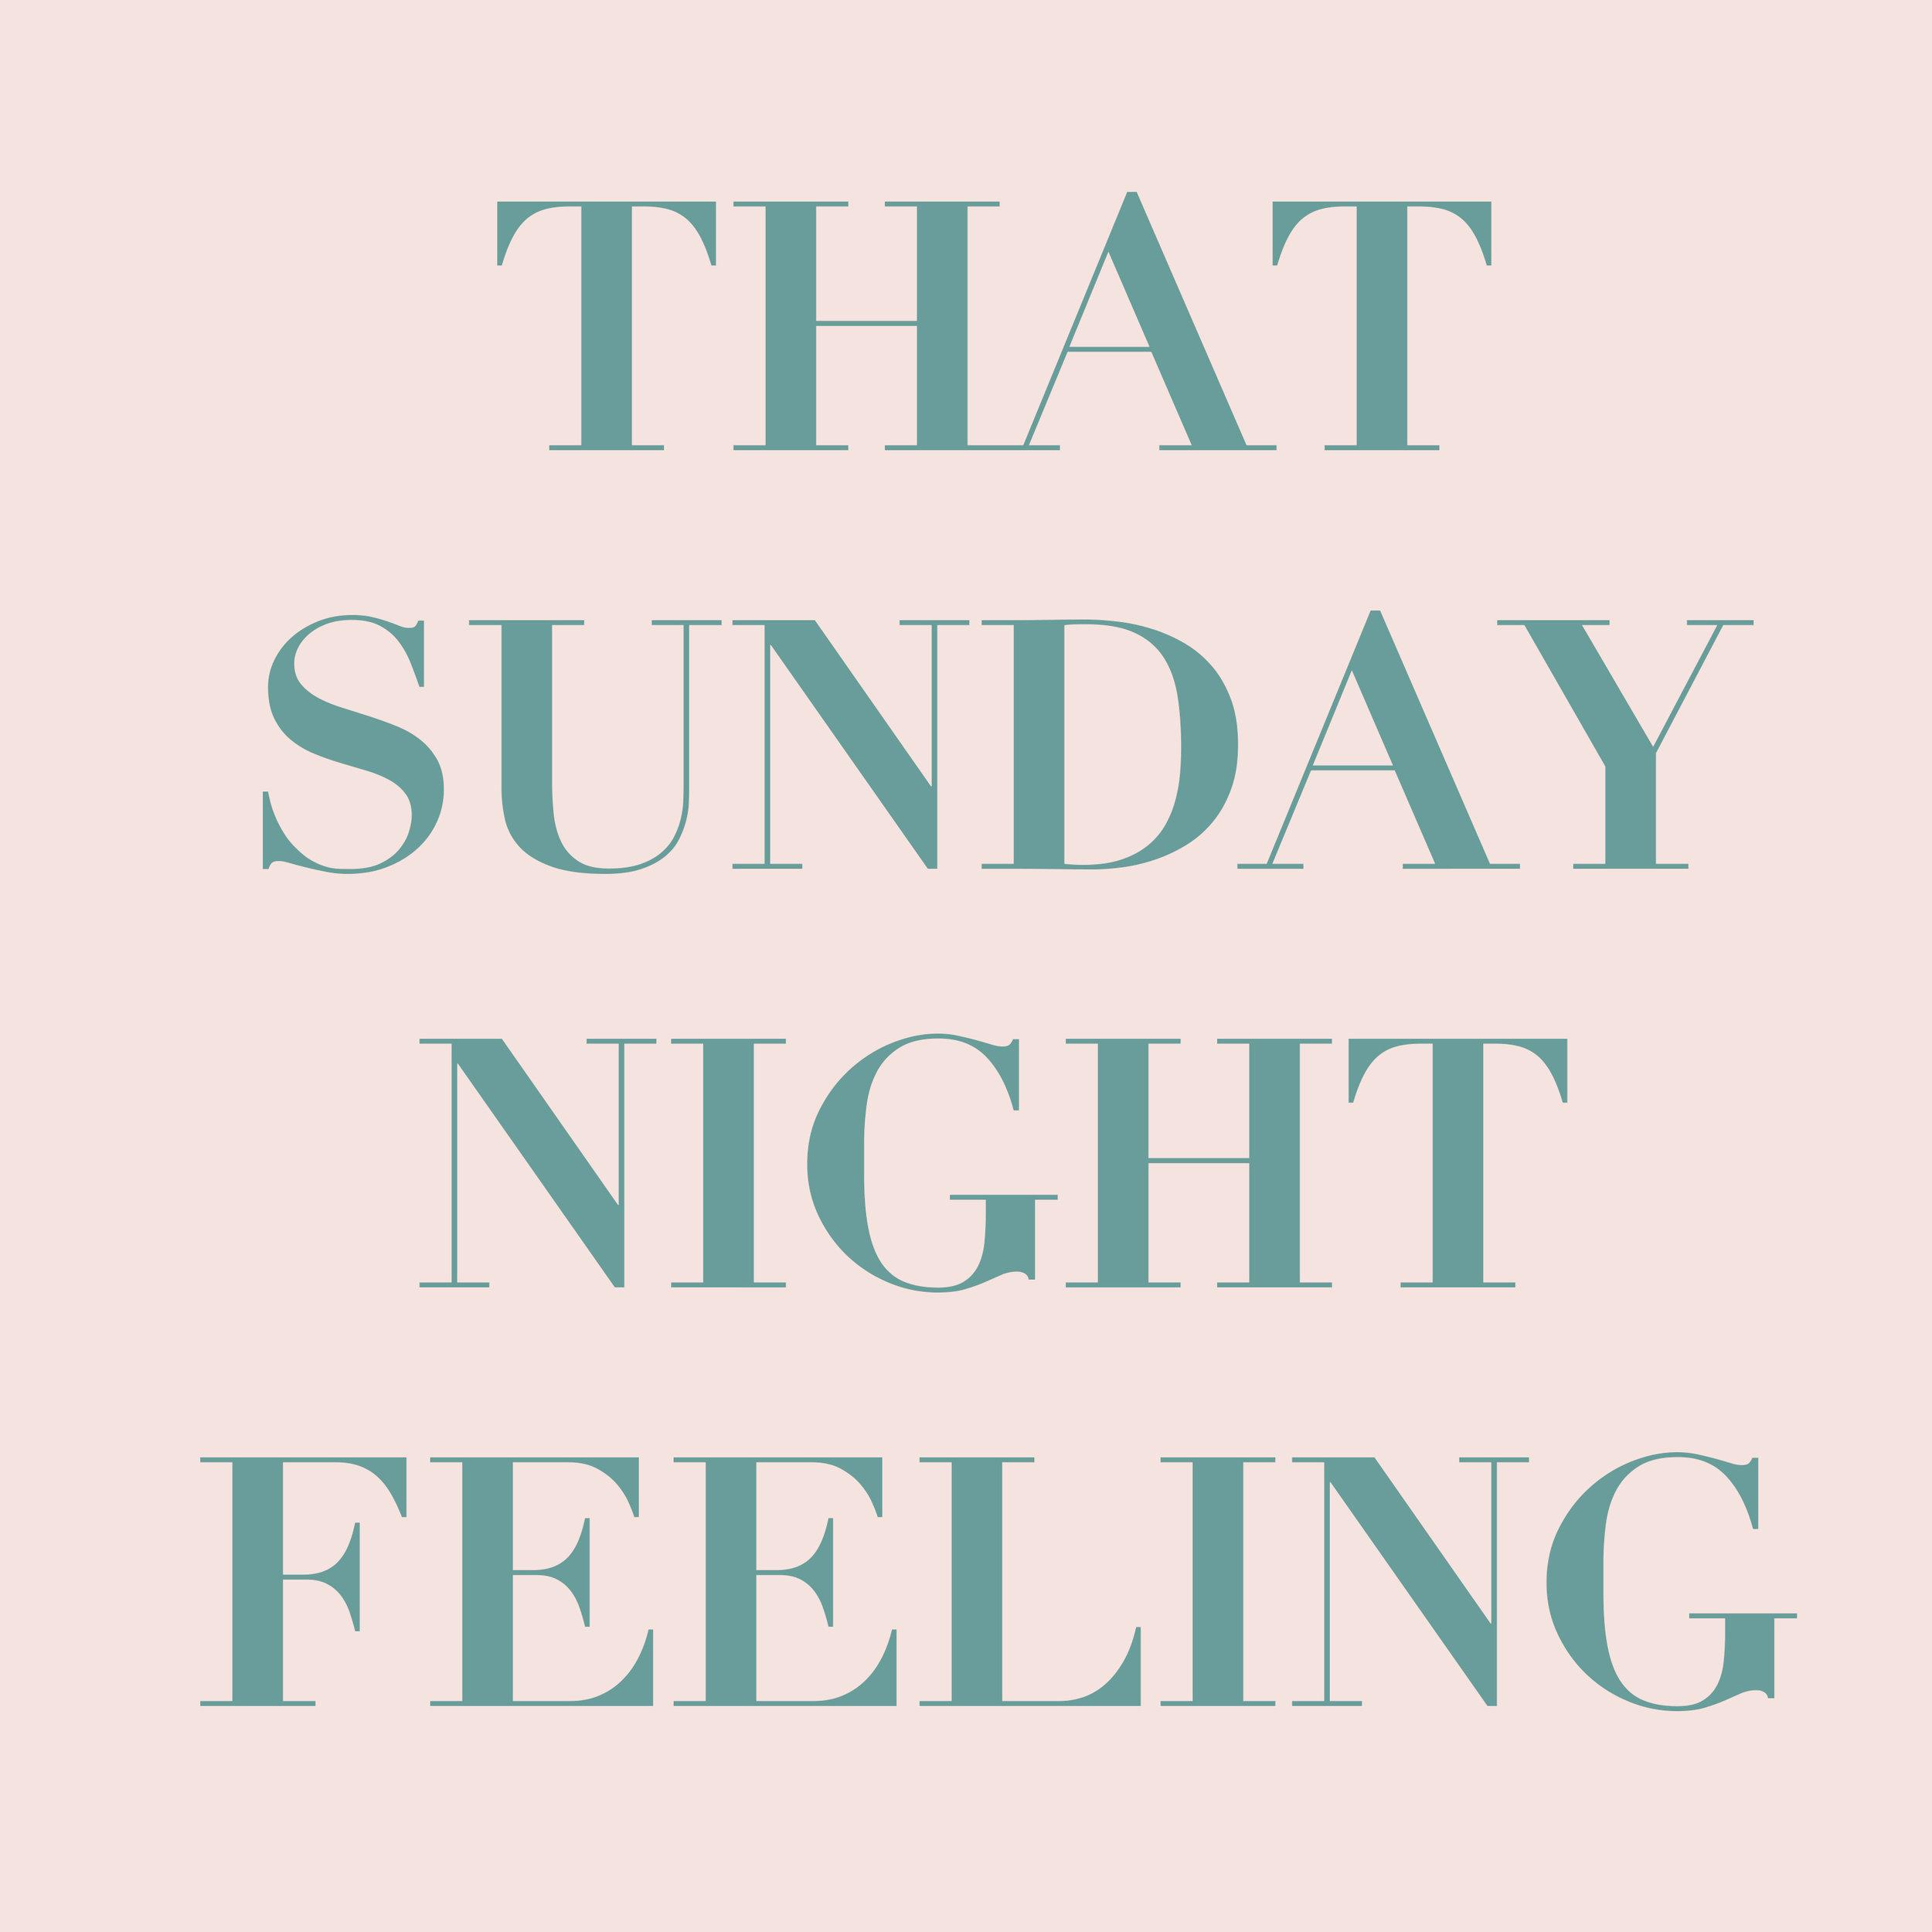 Sunday feelings